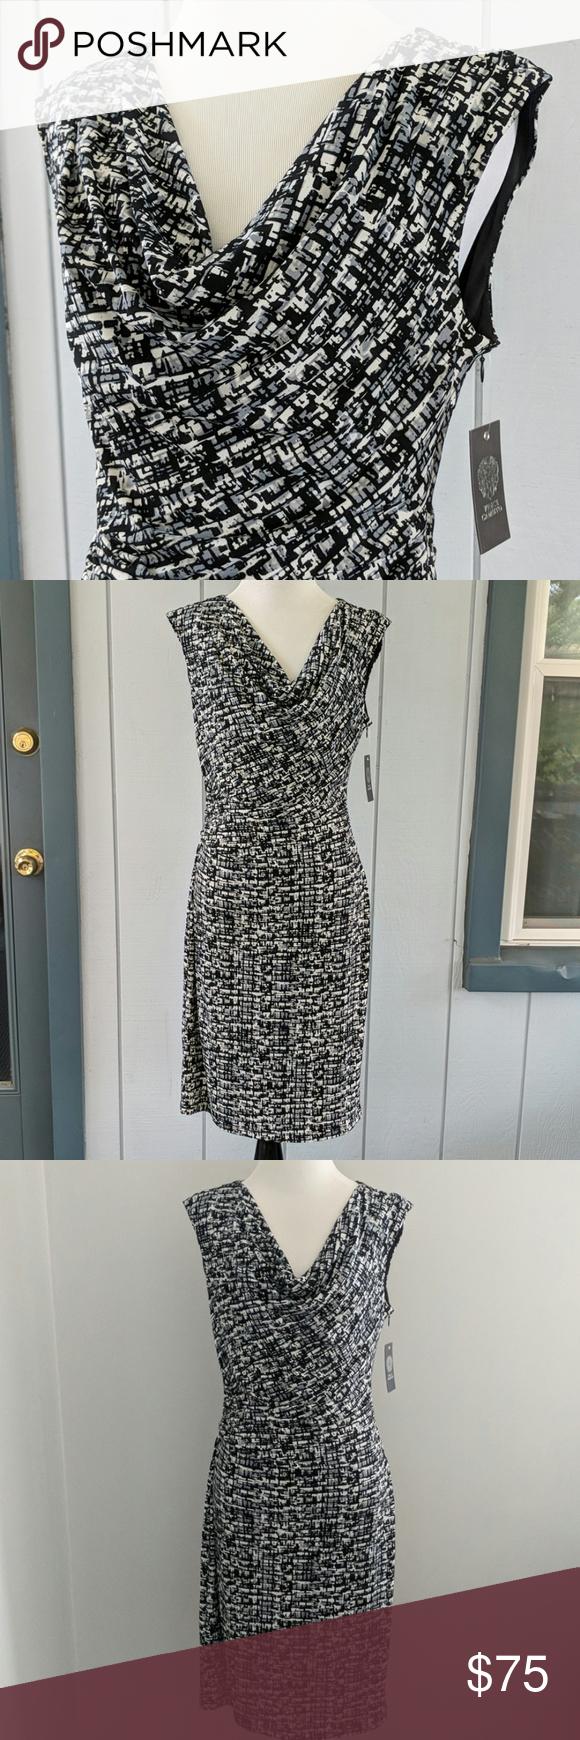 Vince Camuto Dress Nwt Dresses Vince Camuto Dress Clothes Design [ 1740 x 580 Pixel ]